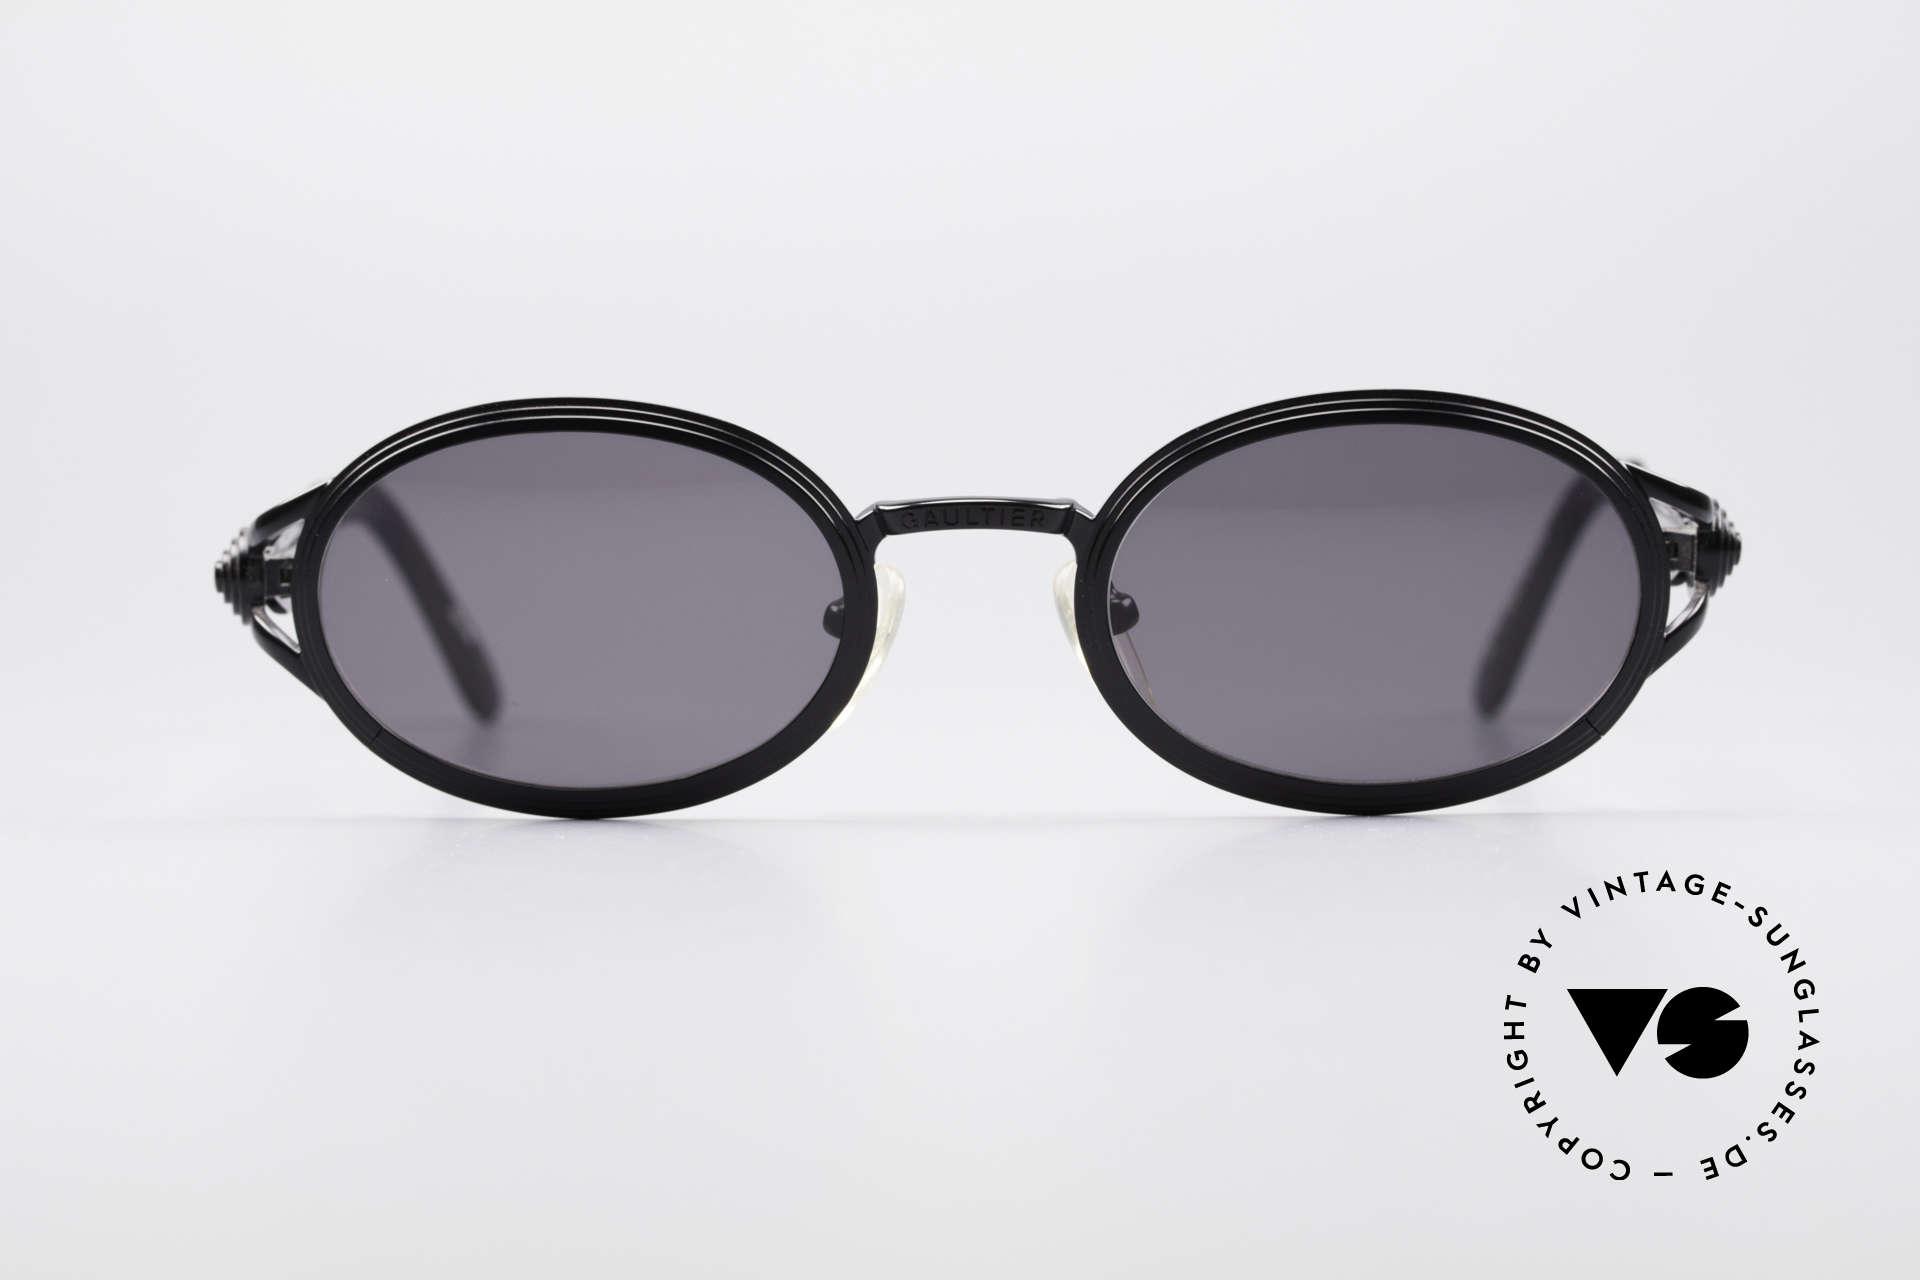 dbf20e2e1 Sunglasses Jean Paul Gaultier 56-7114 Oval Steampunk Sunglasses ...